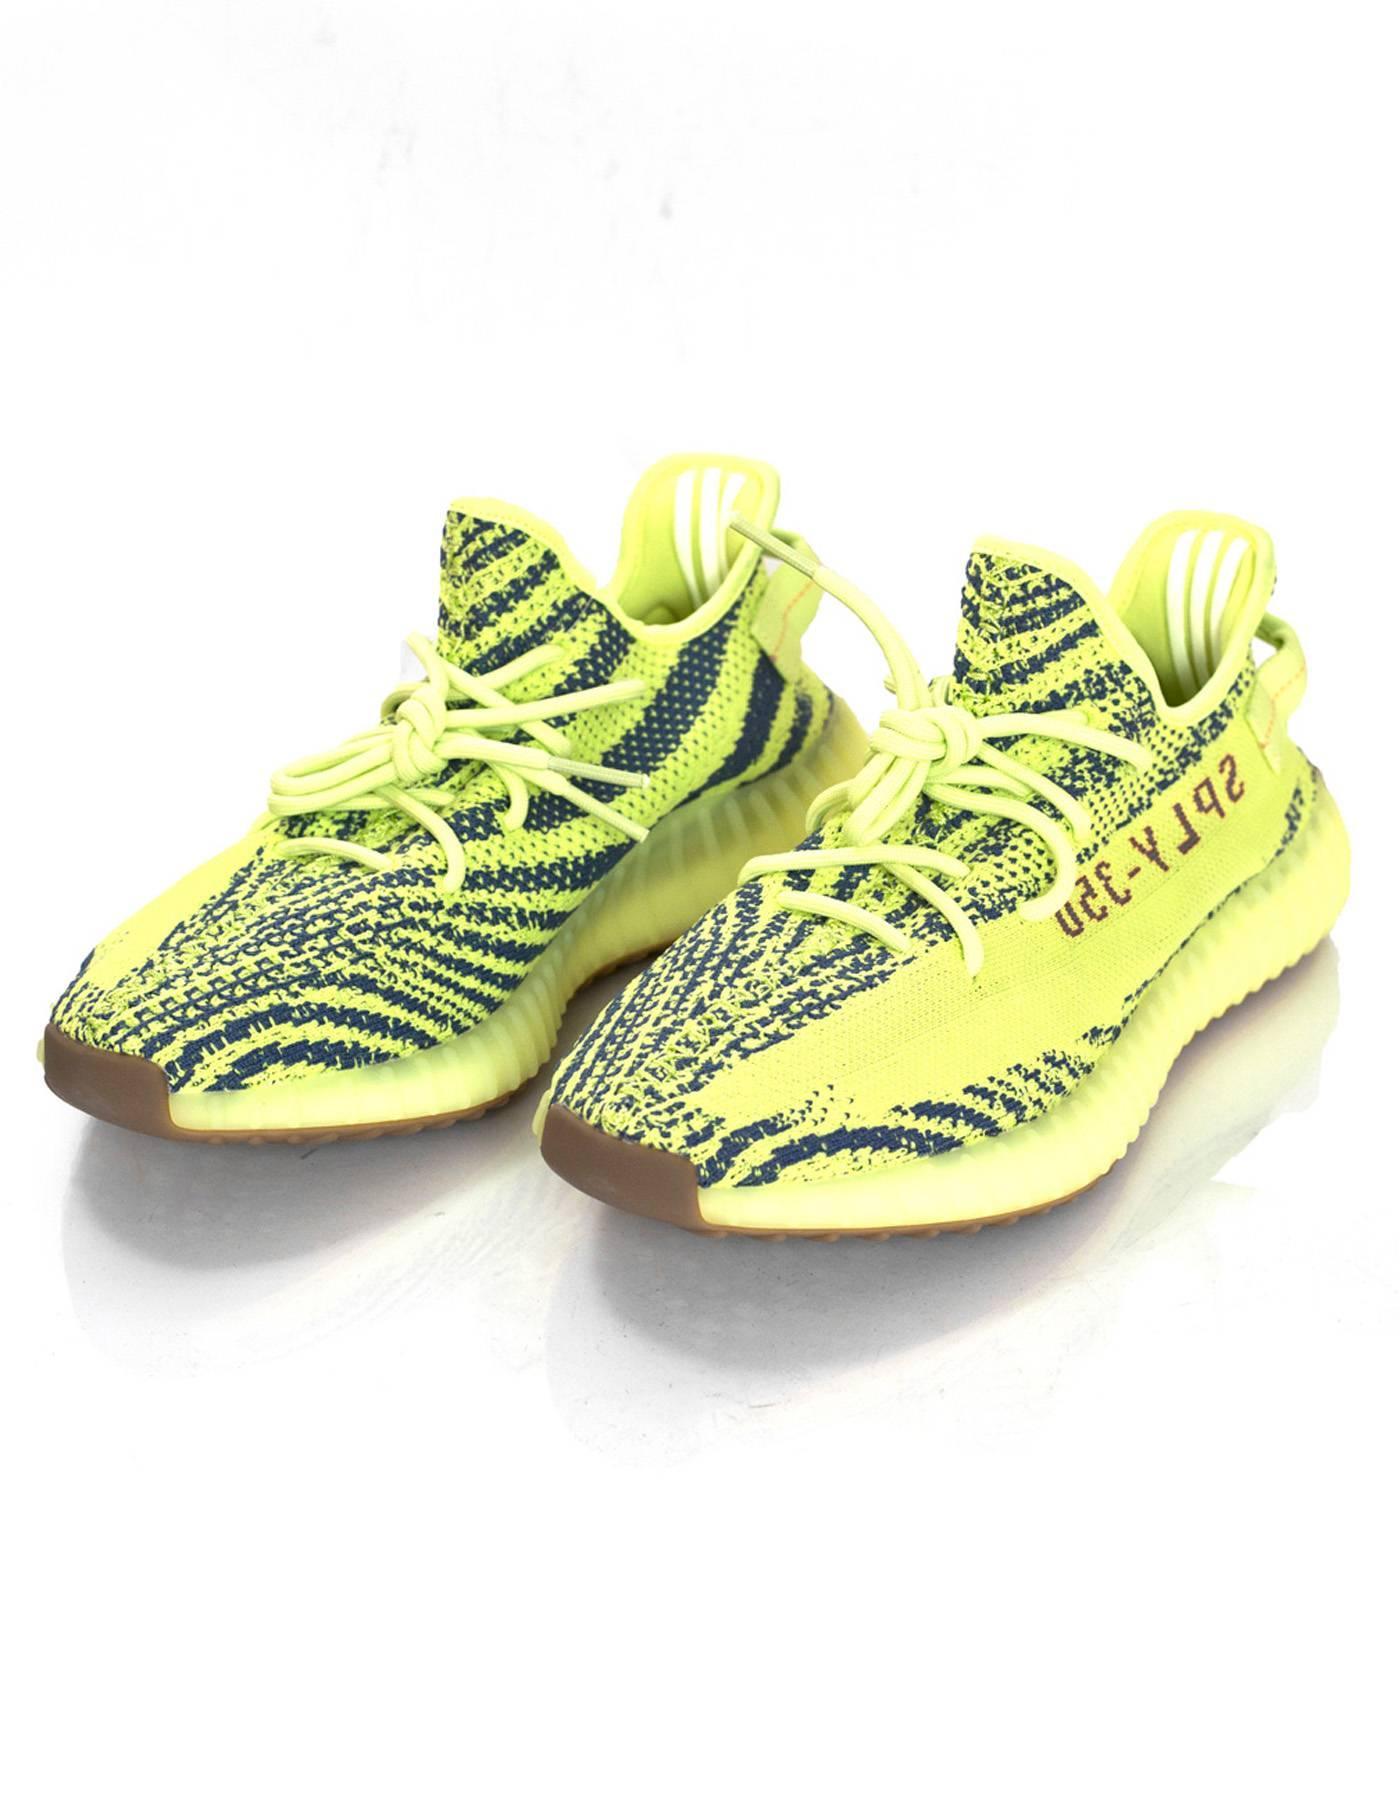 6ddbab4a7 ... new zealand adidas x kanye west yeezy boost 350 v2 semi frozen yellow 2.0  sneakers sz